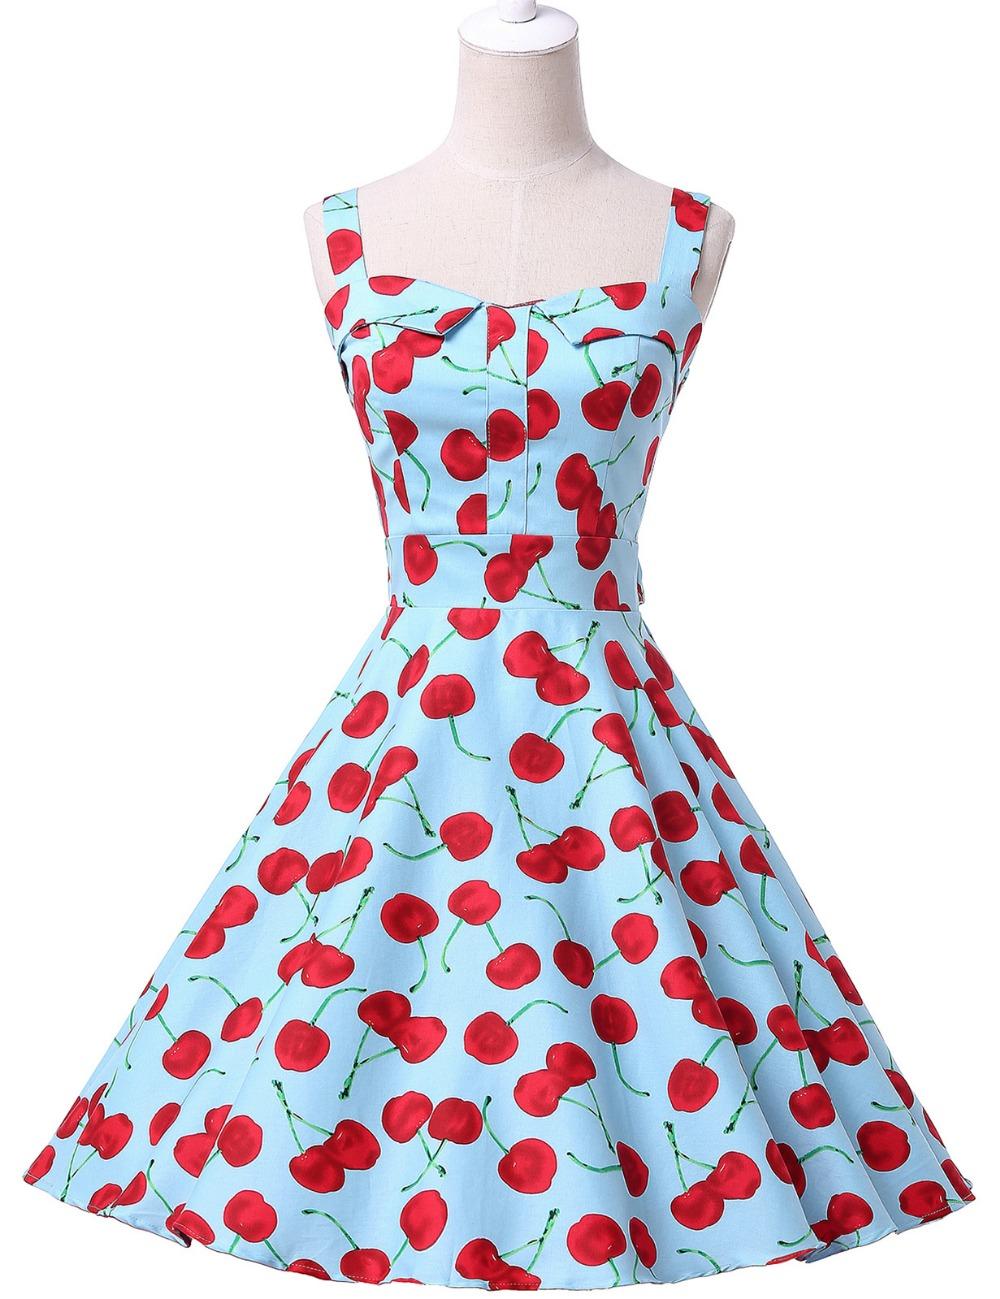 3ddae05bf Women Summer Dress 2017 plus size clothing Audrey hepburn Floral robe Retro  Swing Casual 50s Vintage Rockabilly Dresses VestidosUSD 47.62/piece